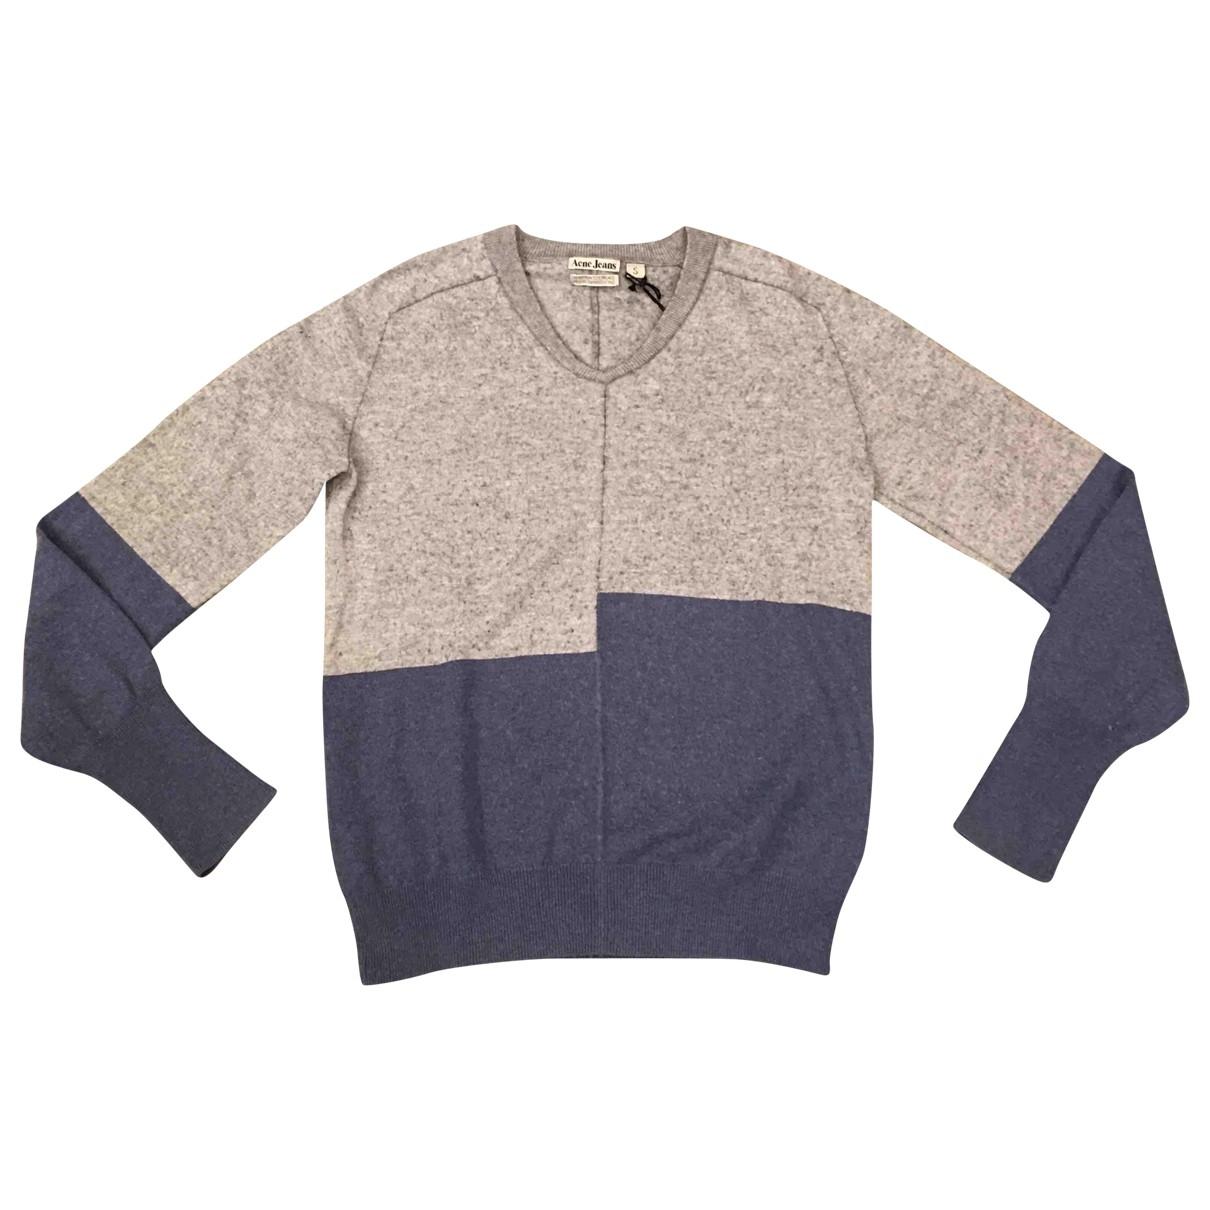 Acne Studios \N Grey Wool Knitwear & Sweatshirts for Men S International